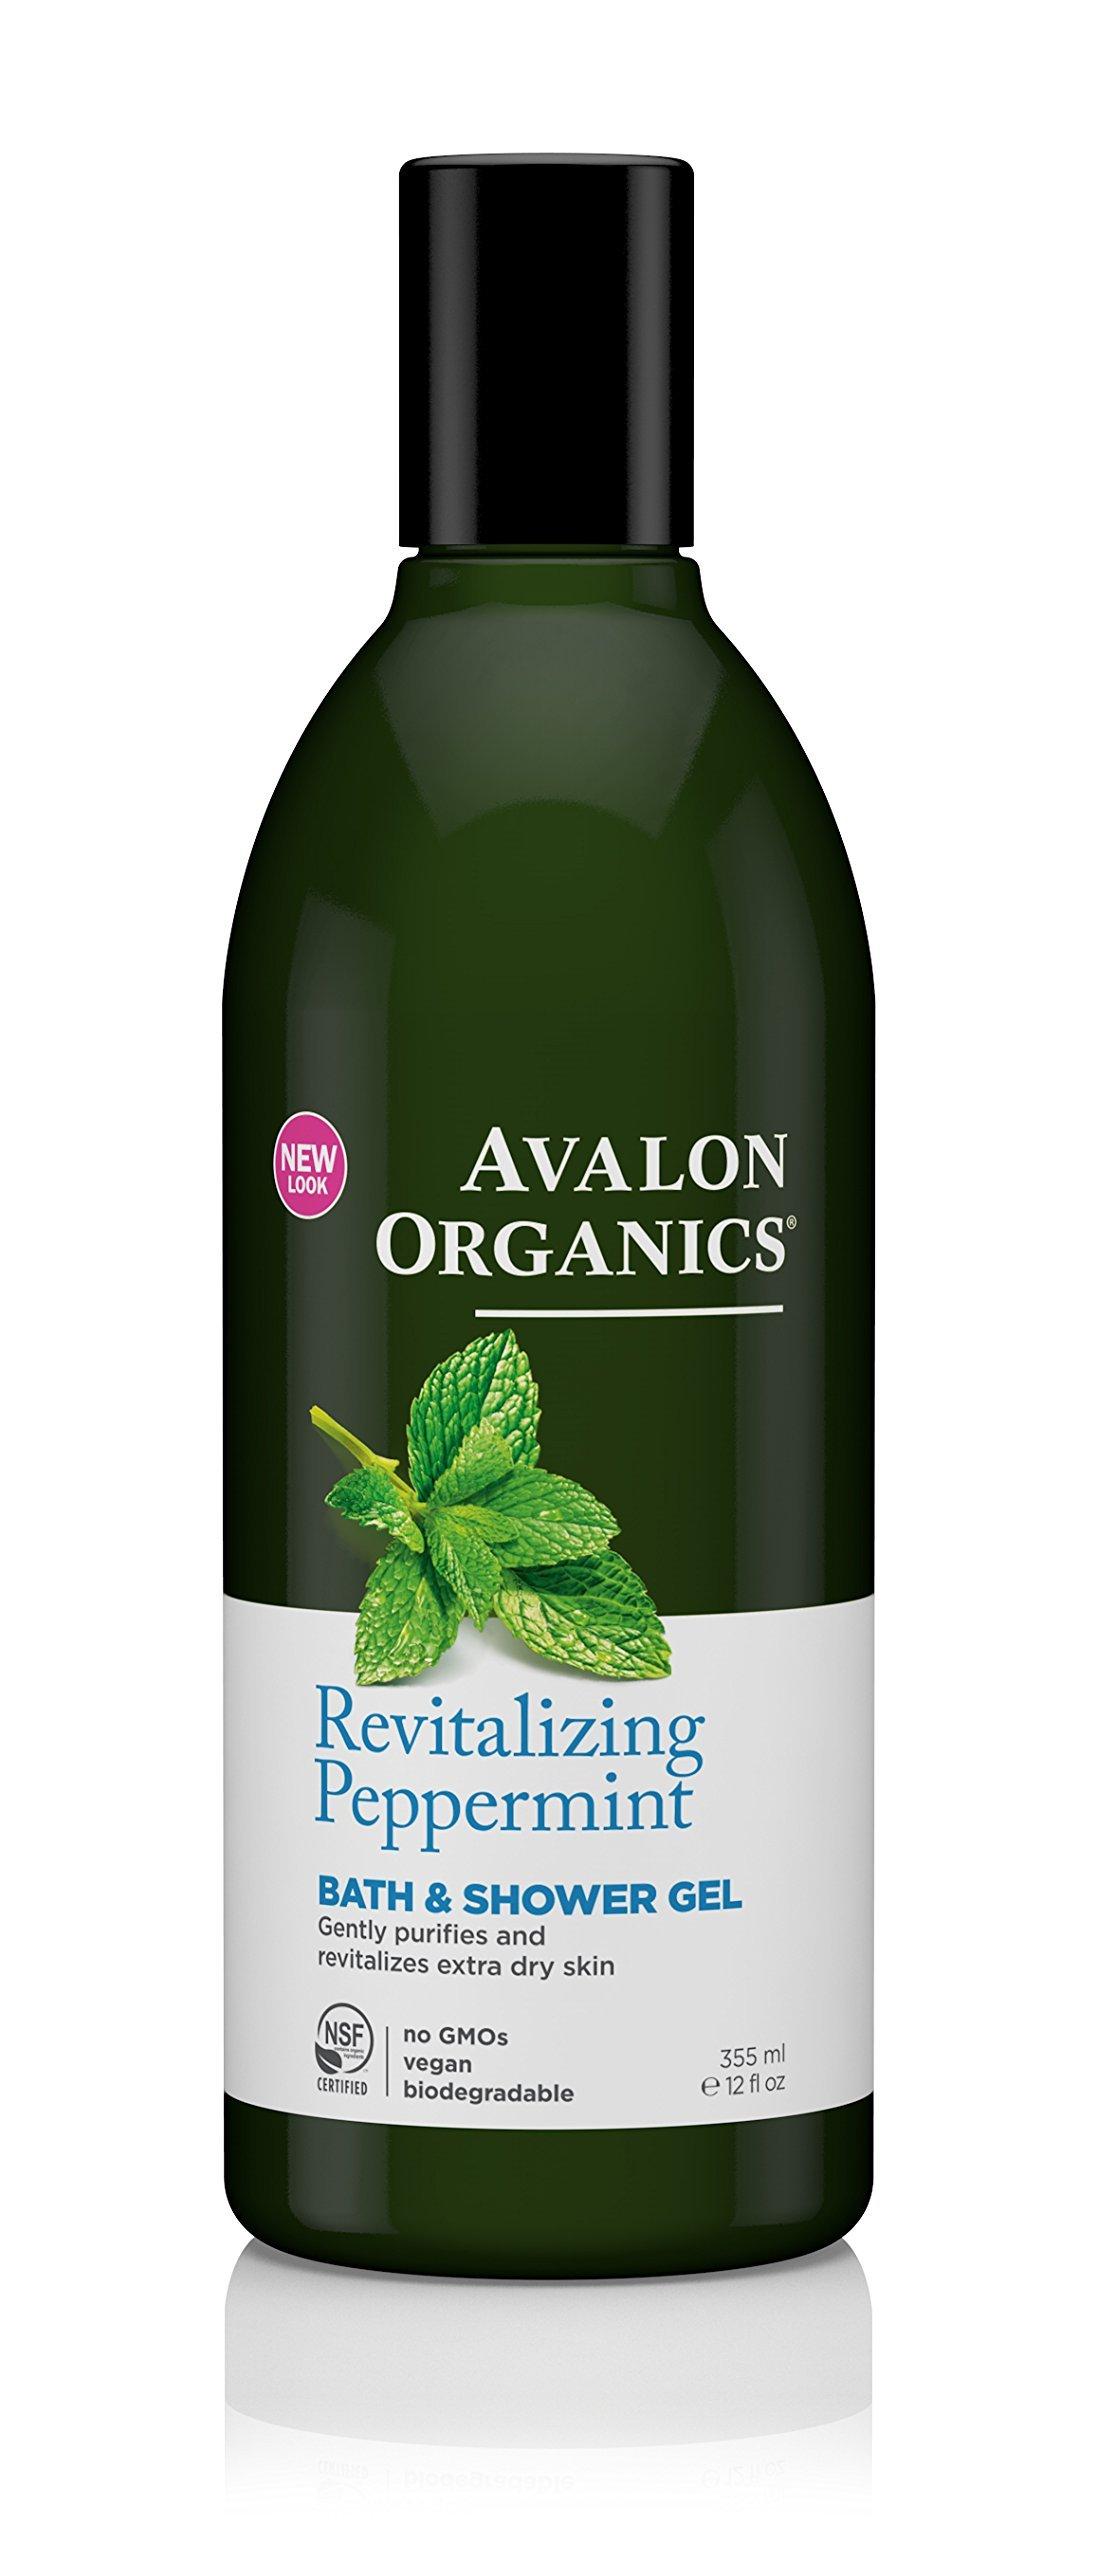 Avalon Organics Bath & Shower Gel, Revitalizing Peppermint, 12 Fluid Ounce